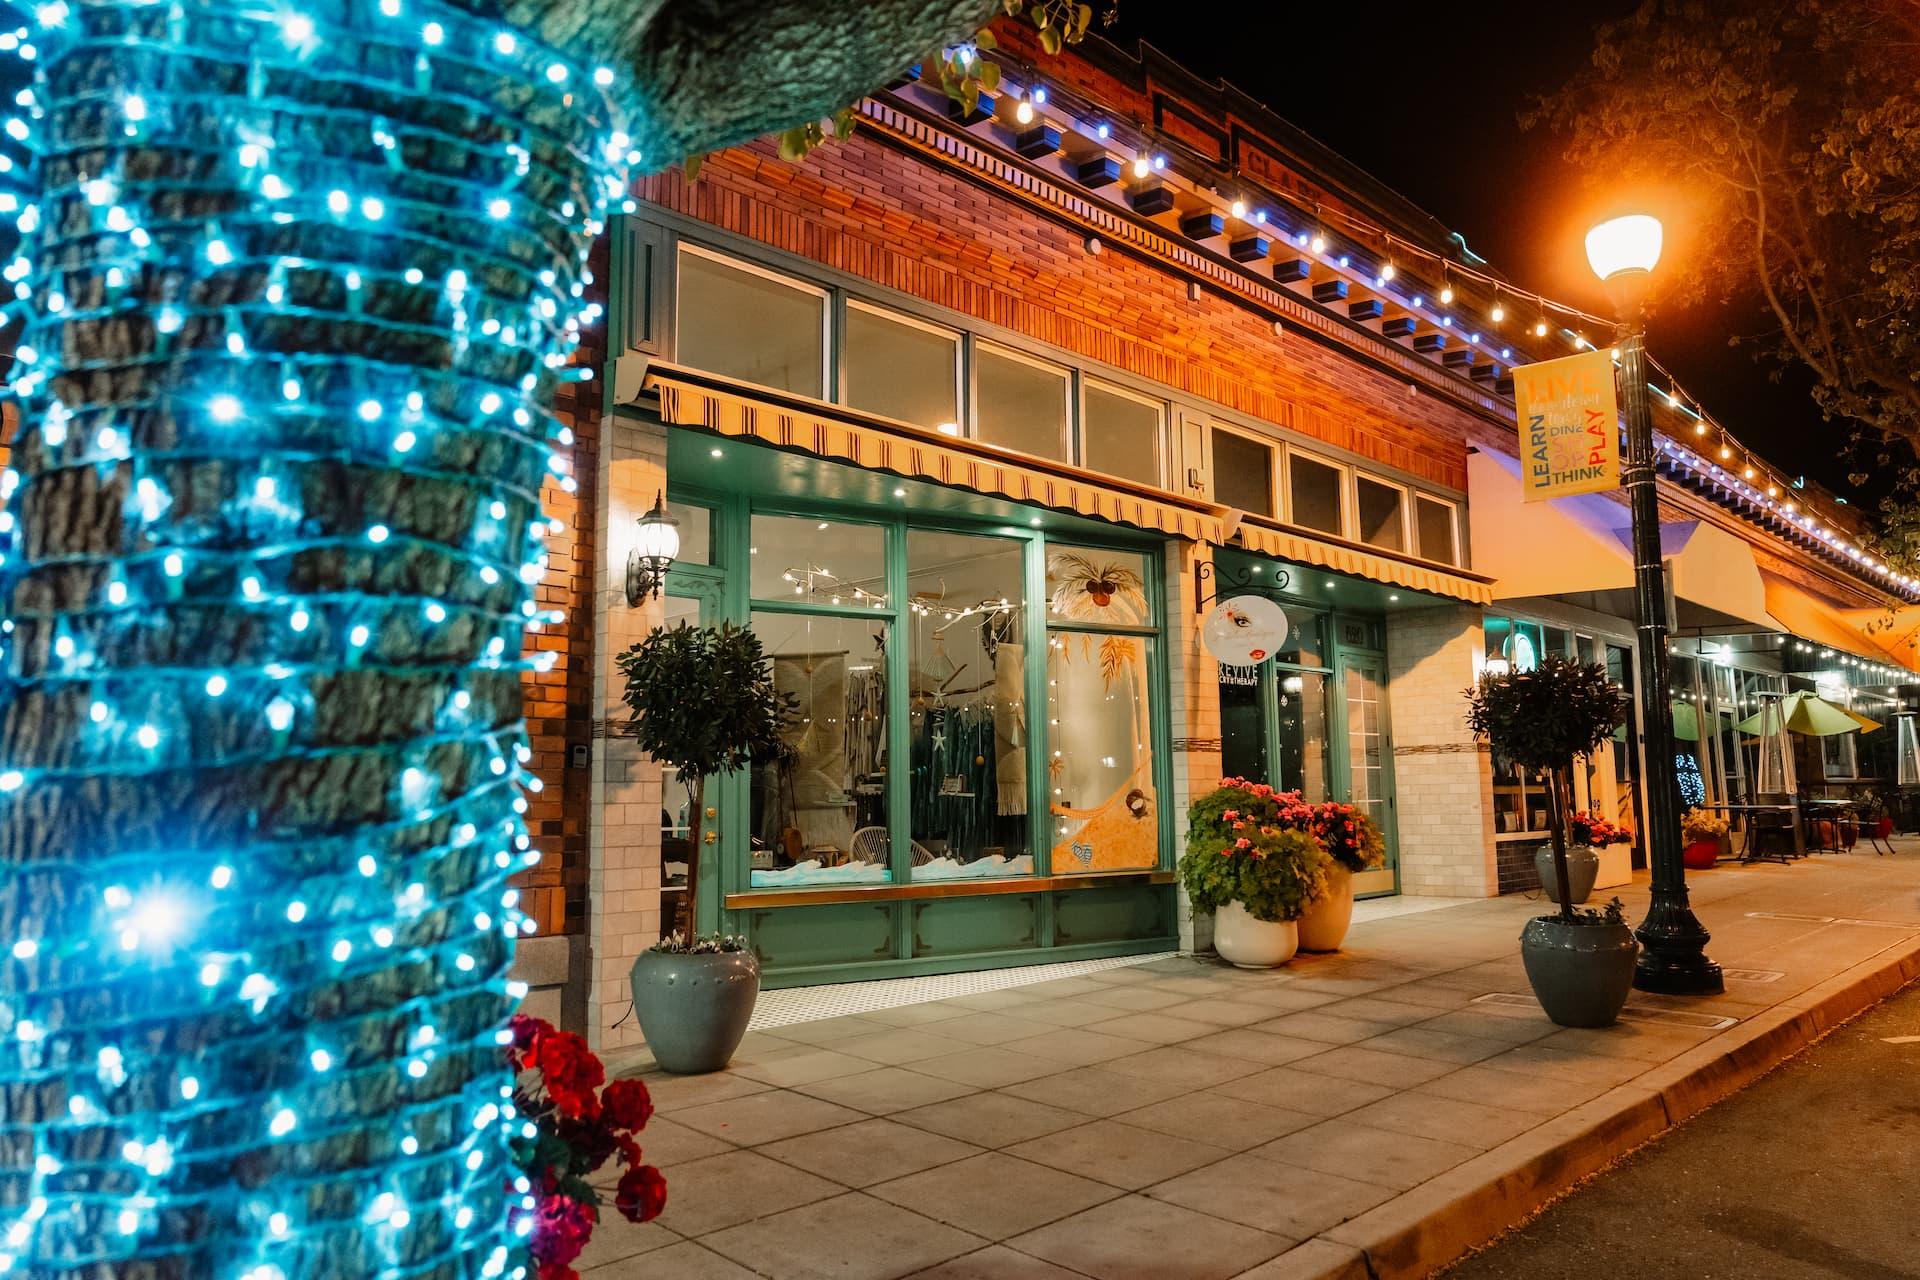 downtown ellis storefronts at night